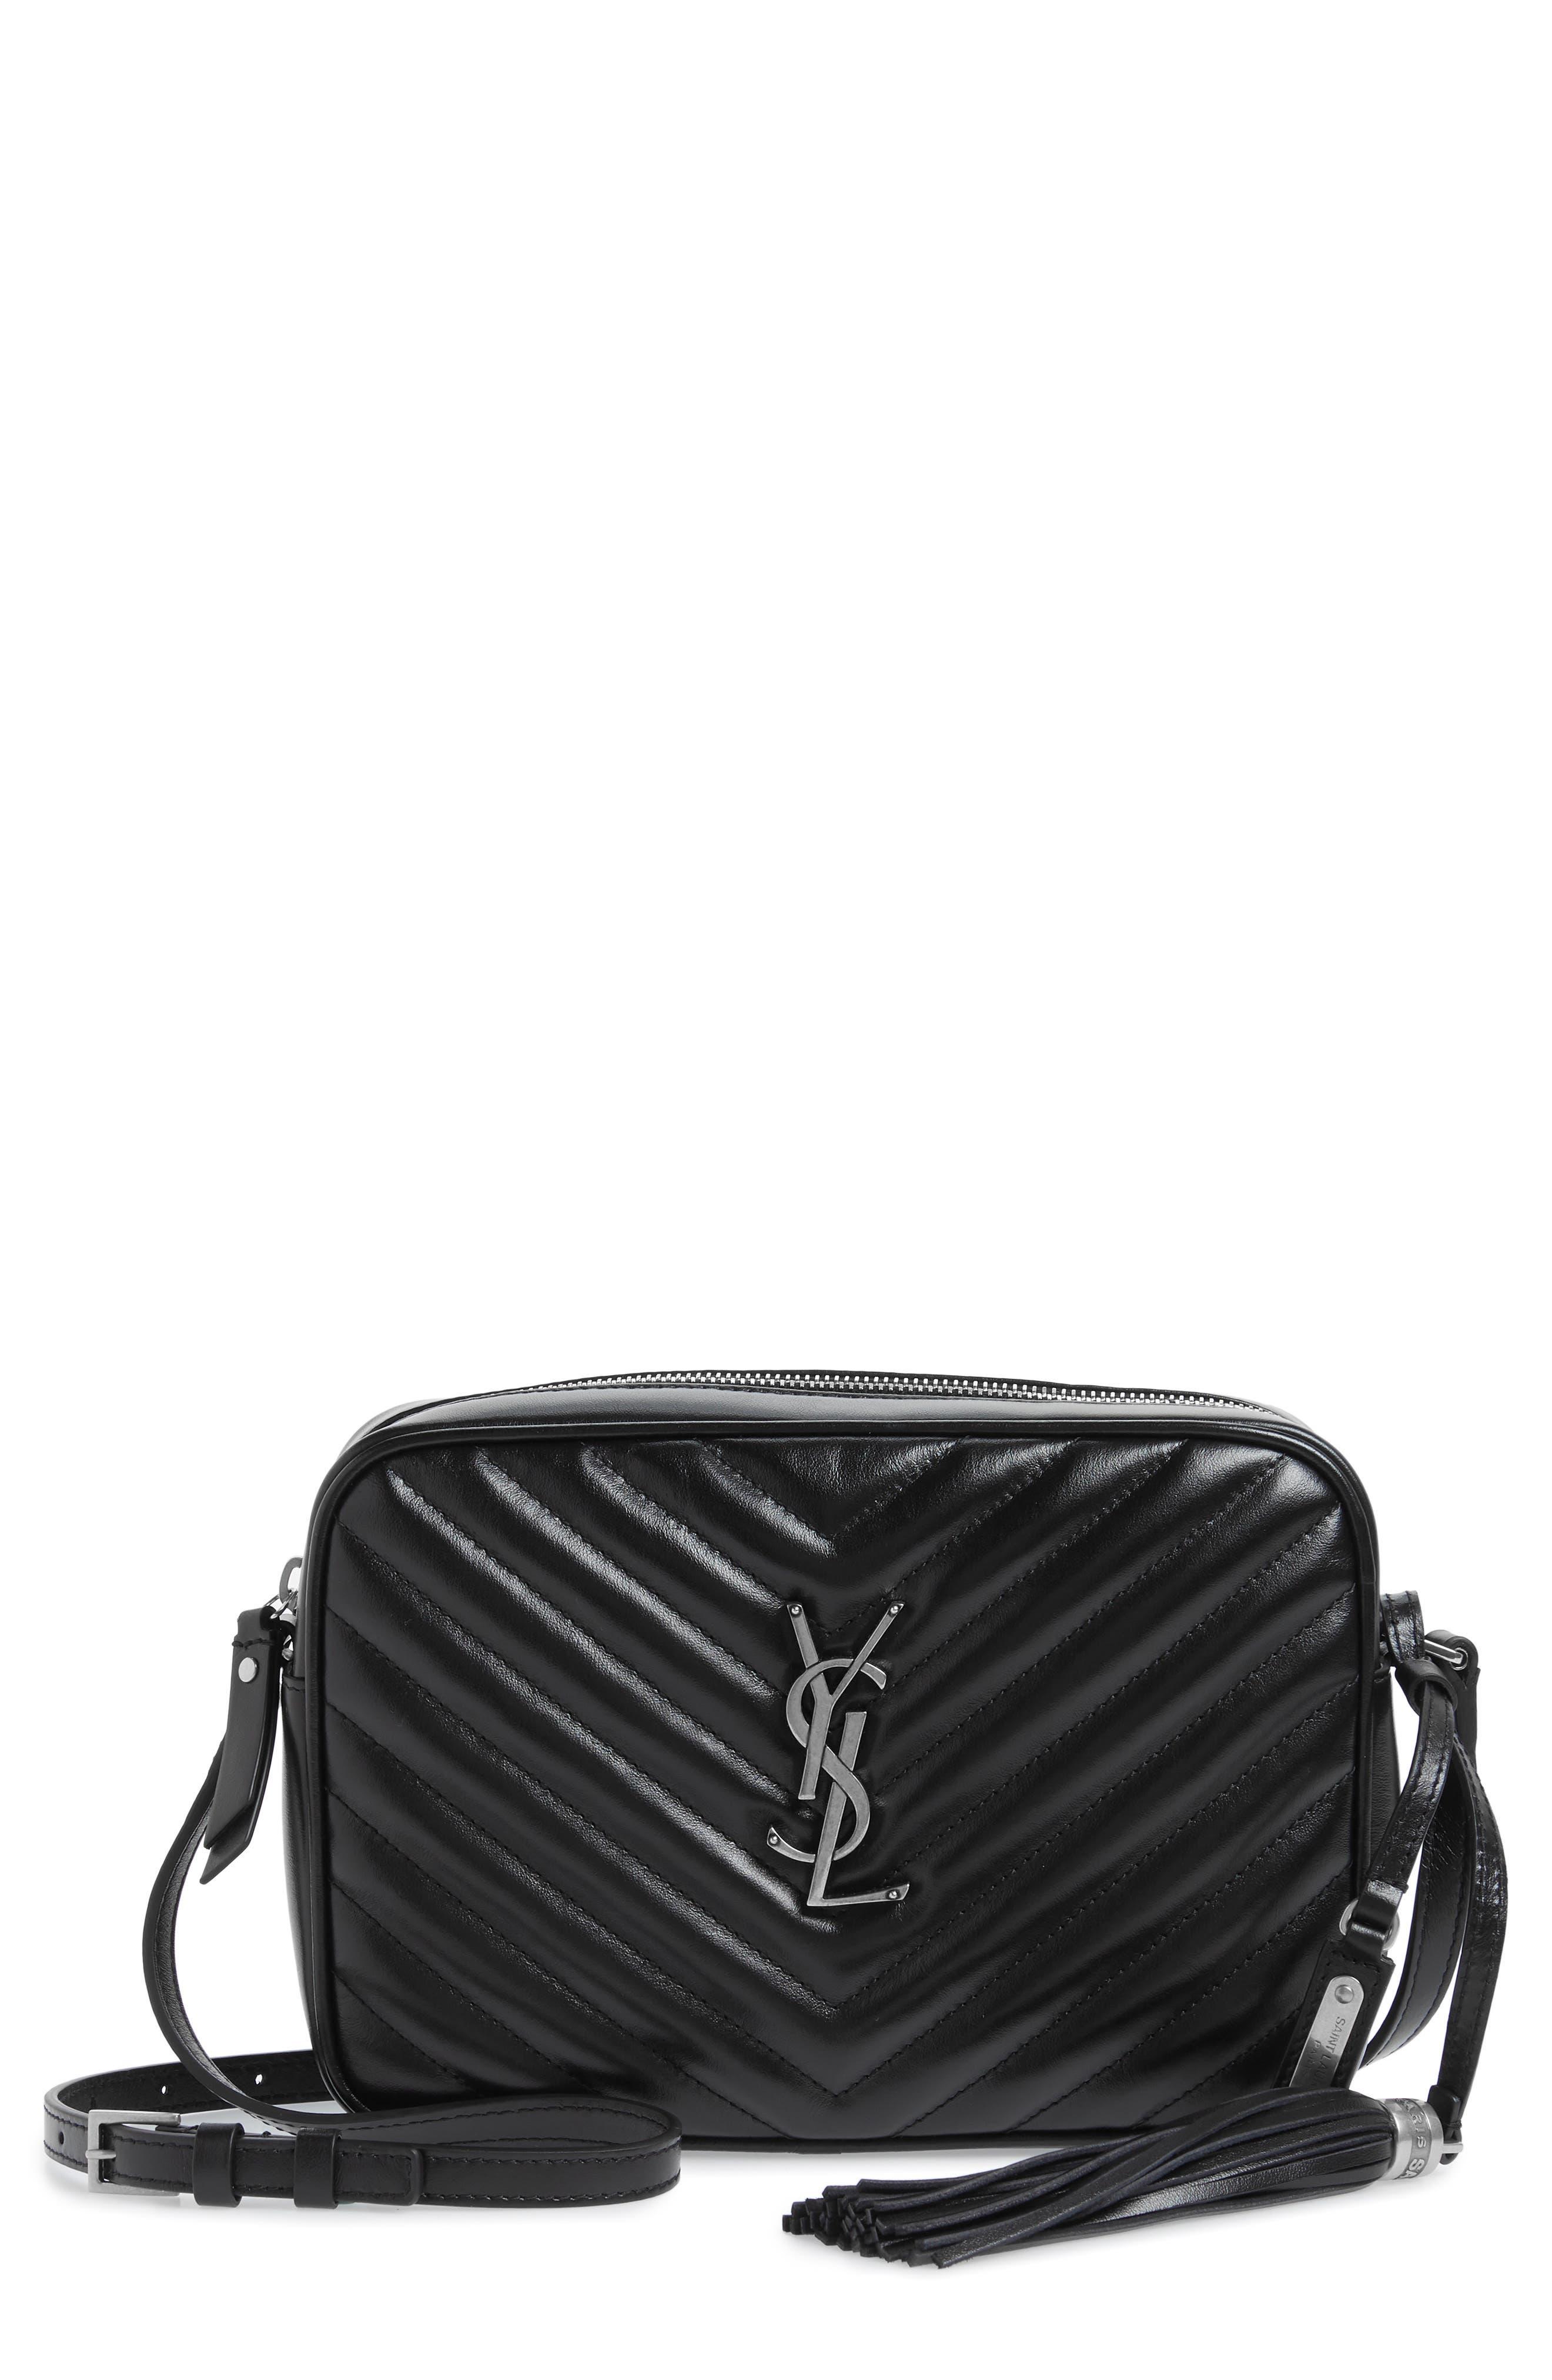 Medium Lou Calfskin Leather Camera Bag,                             Main thumbnail 1, color,                             001